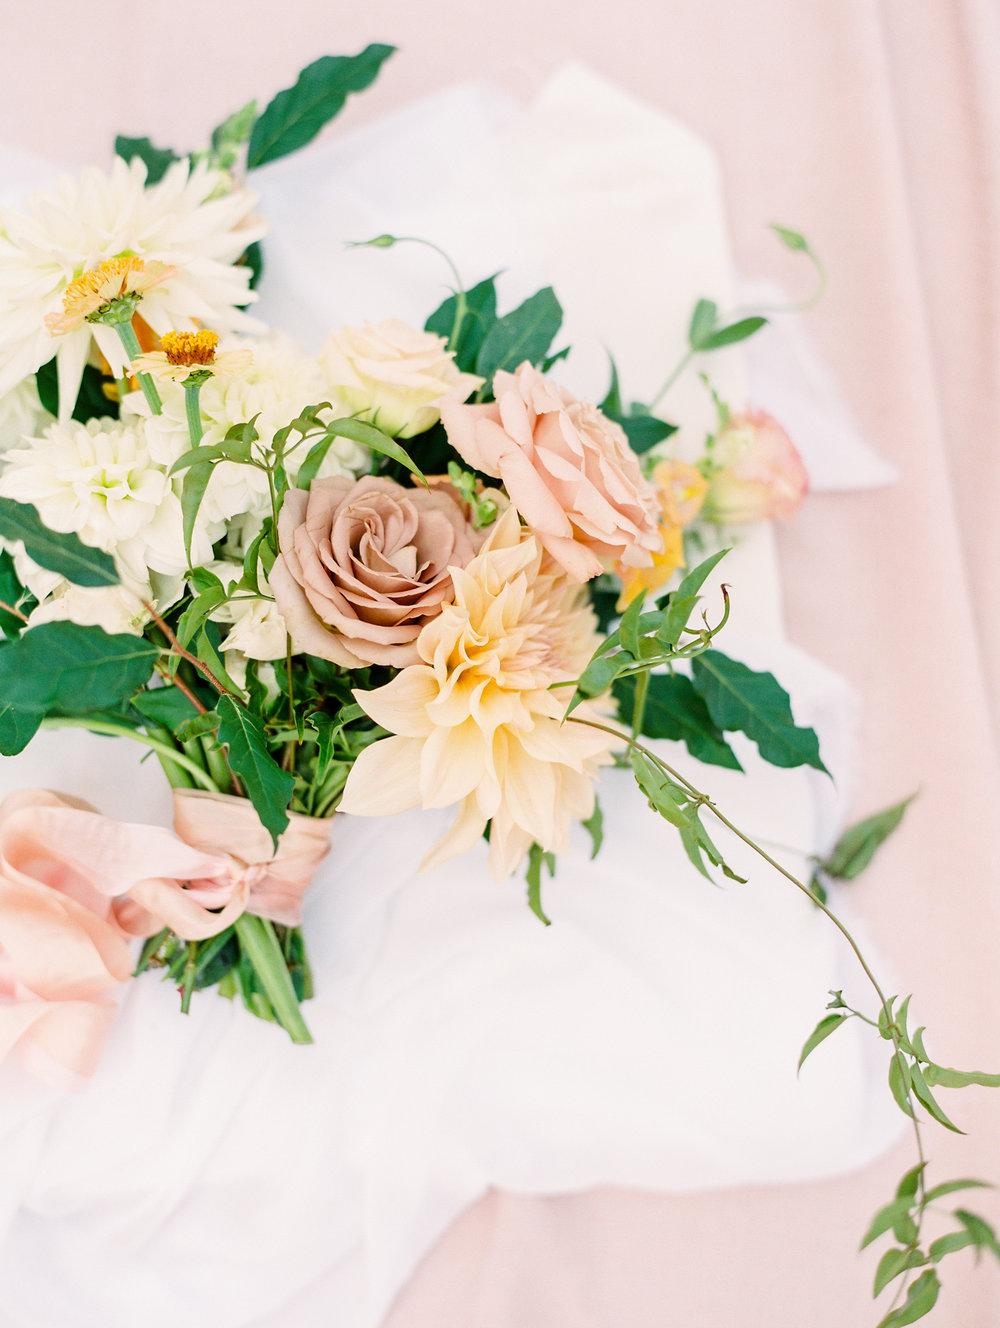 Zoller+Wedding+Details-22.jpg